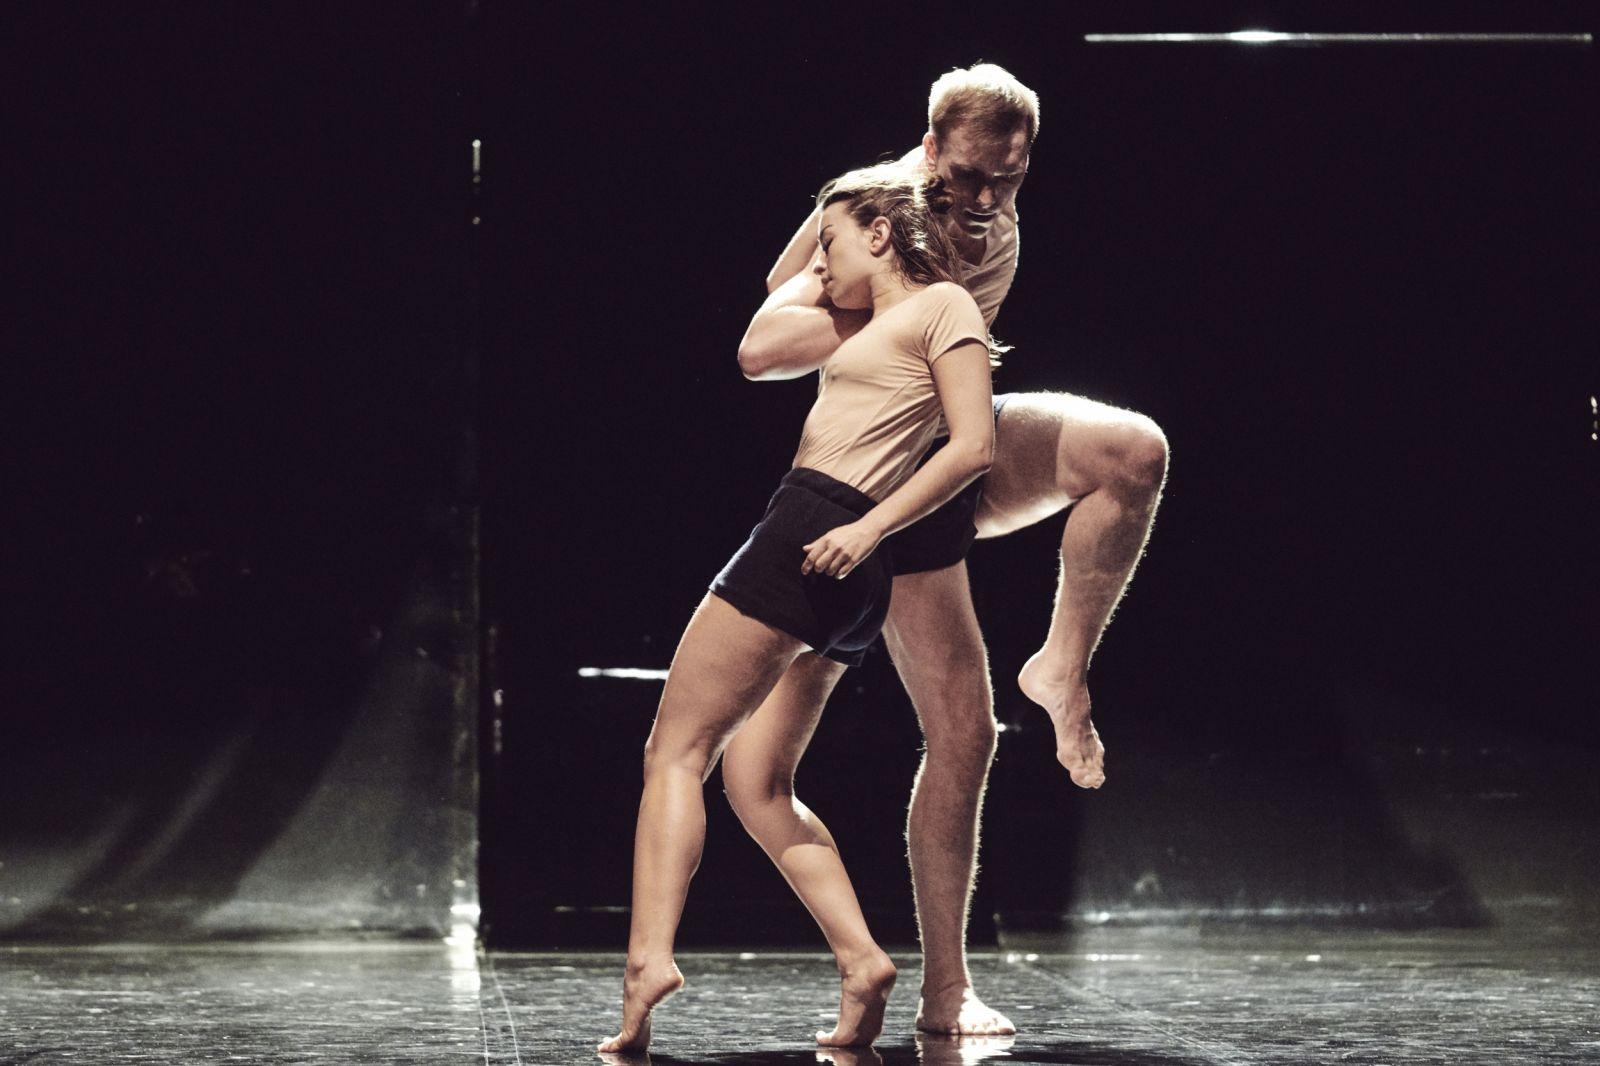 danse2021_yuval_pick_credit_sebastien_erome_01.jpg